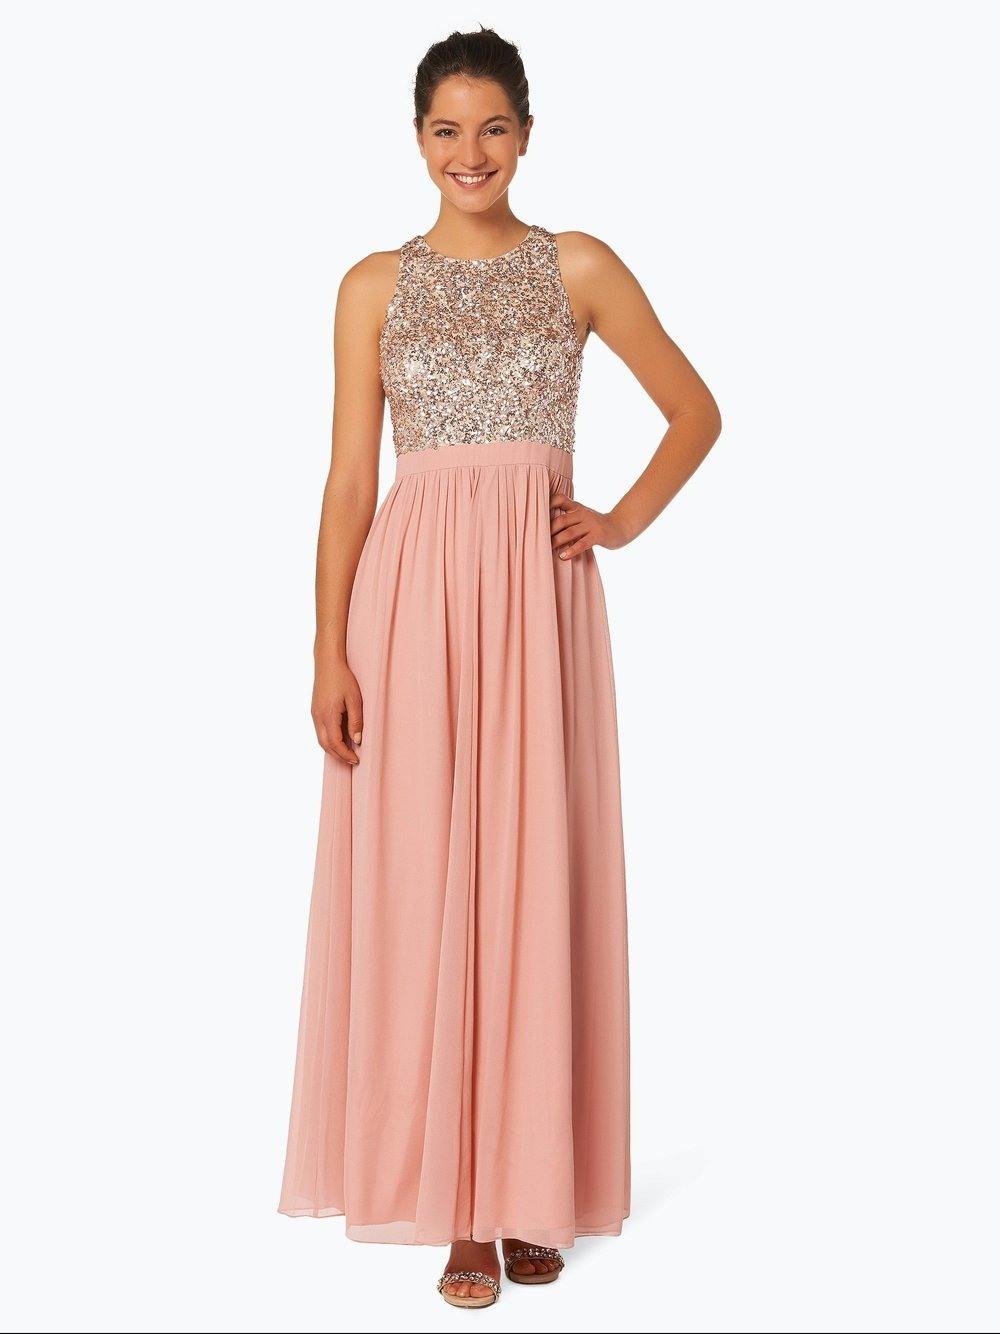 13 Top Abendkleid De BoutiqueFormal Großartig Abendkleid De Vertrieb